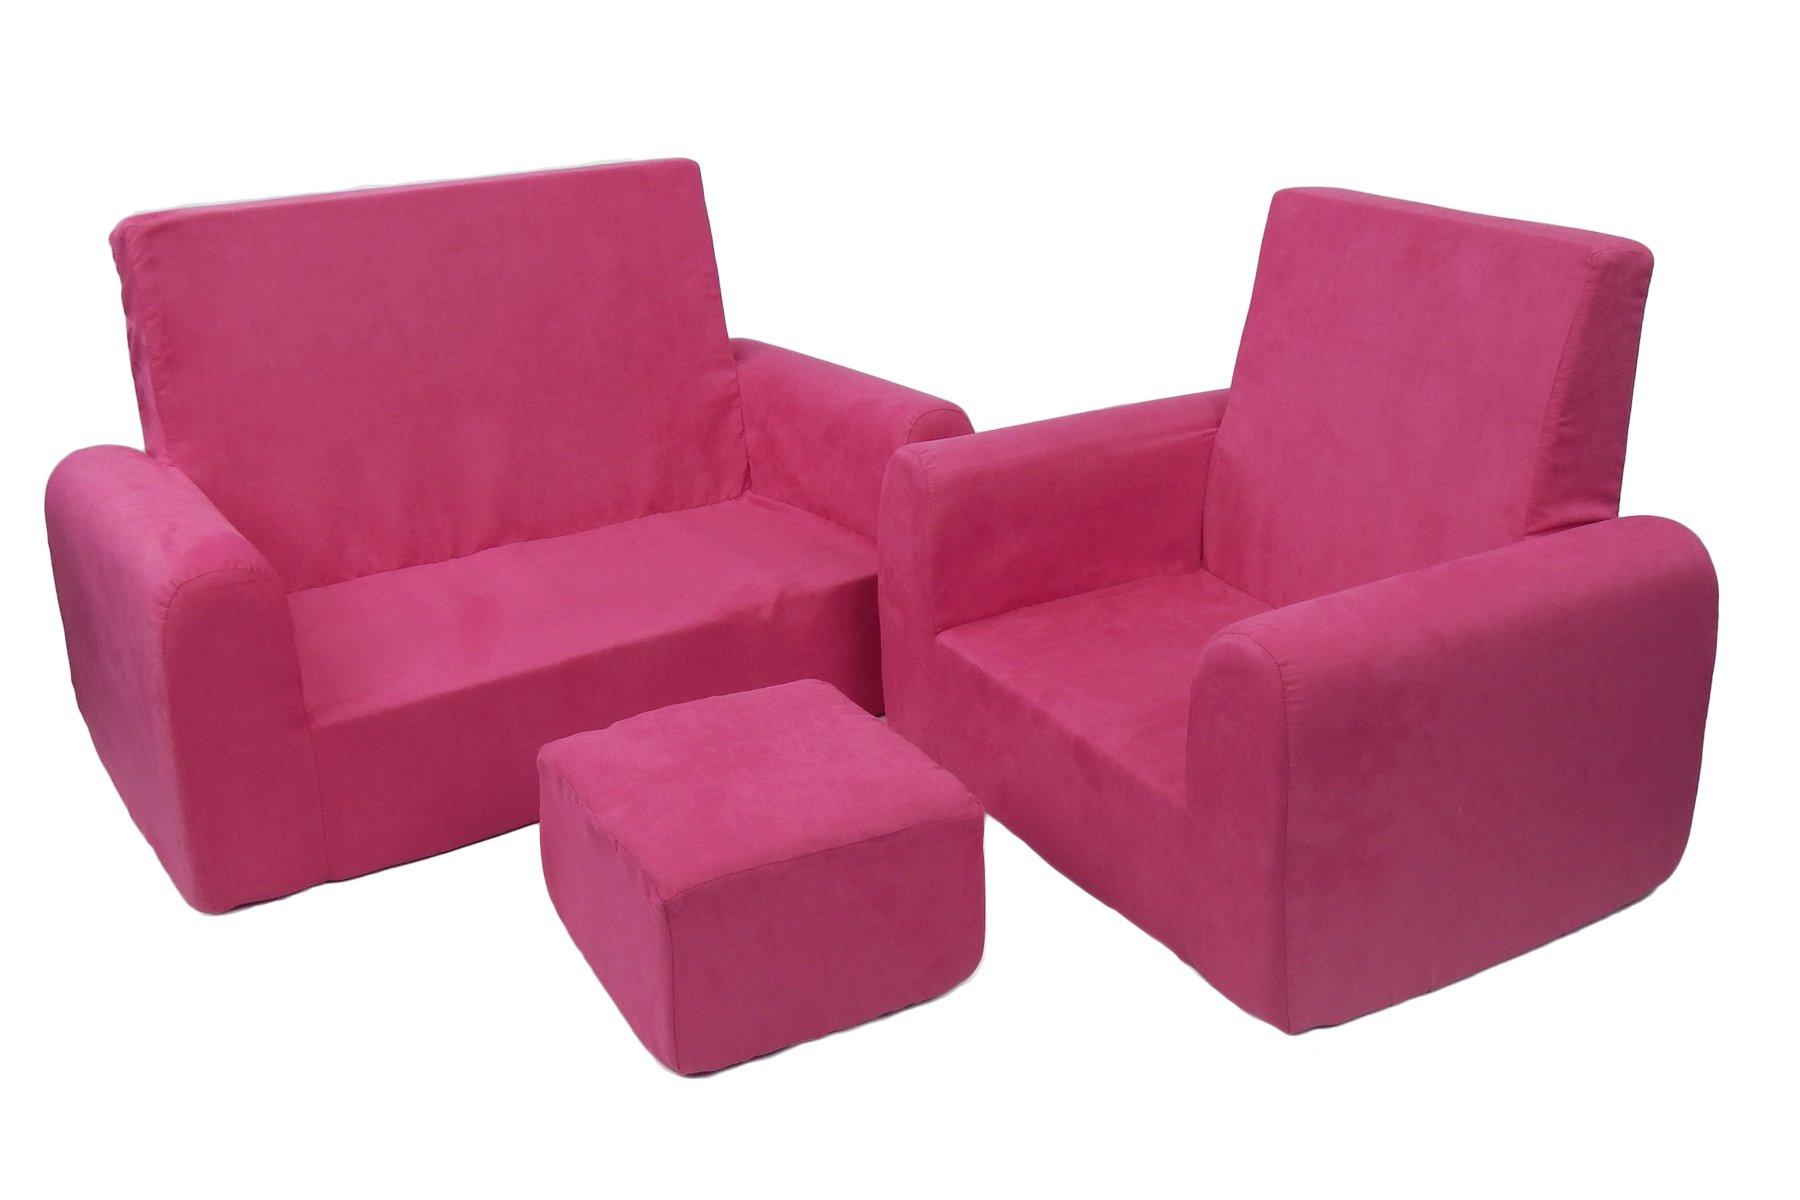 Fun Furnishings 65204 Toddler Sofa, Chair and Ottoman Set